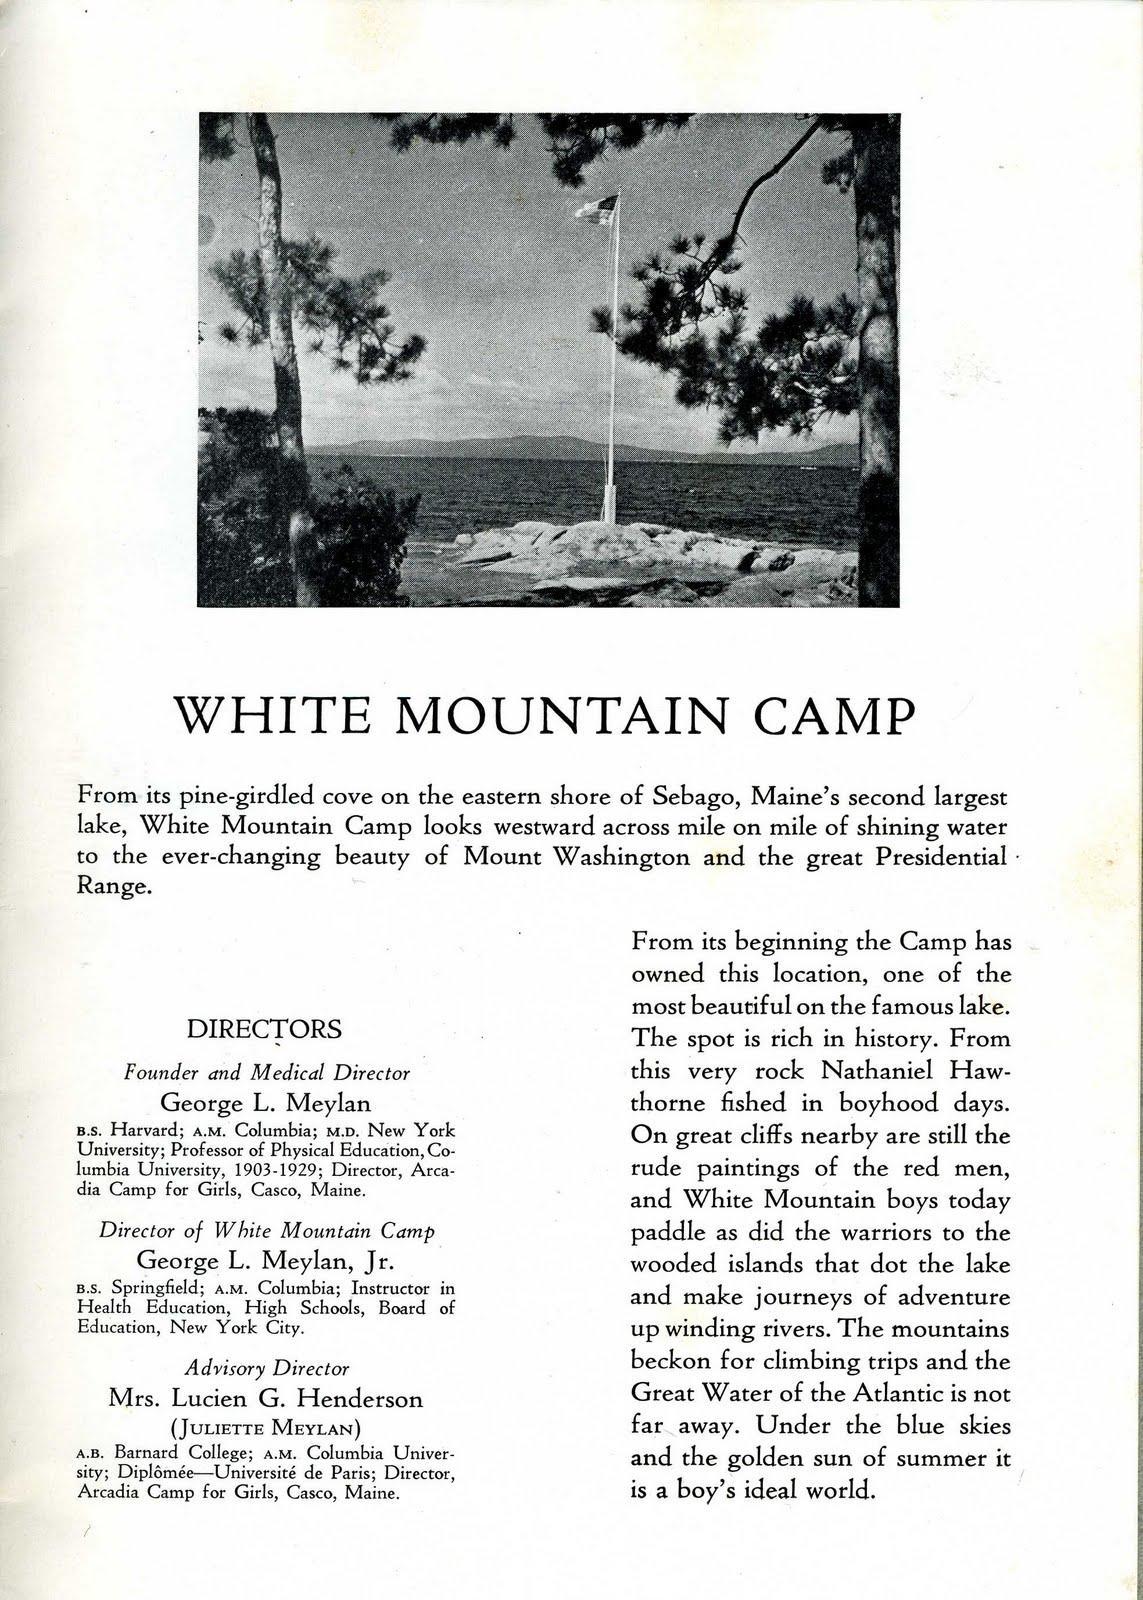 1941 White Mountain Camp Brochure